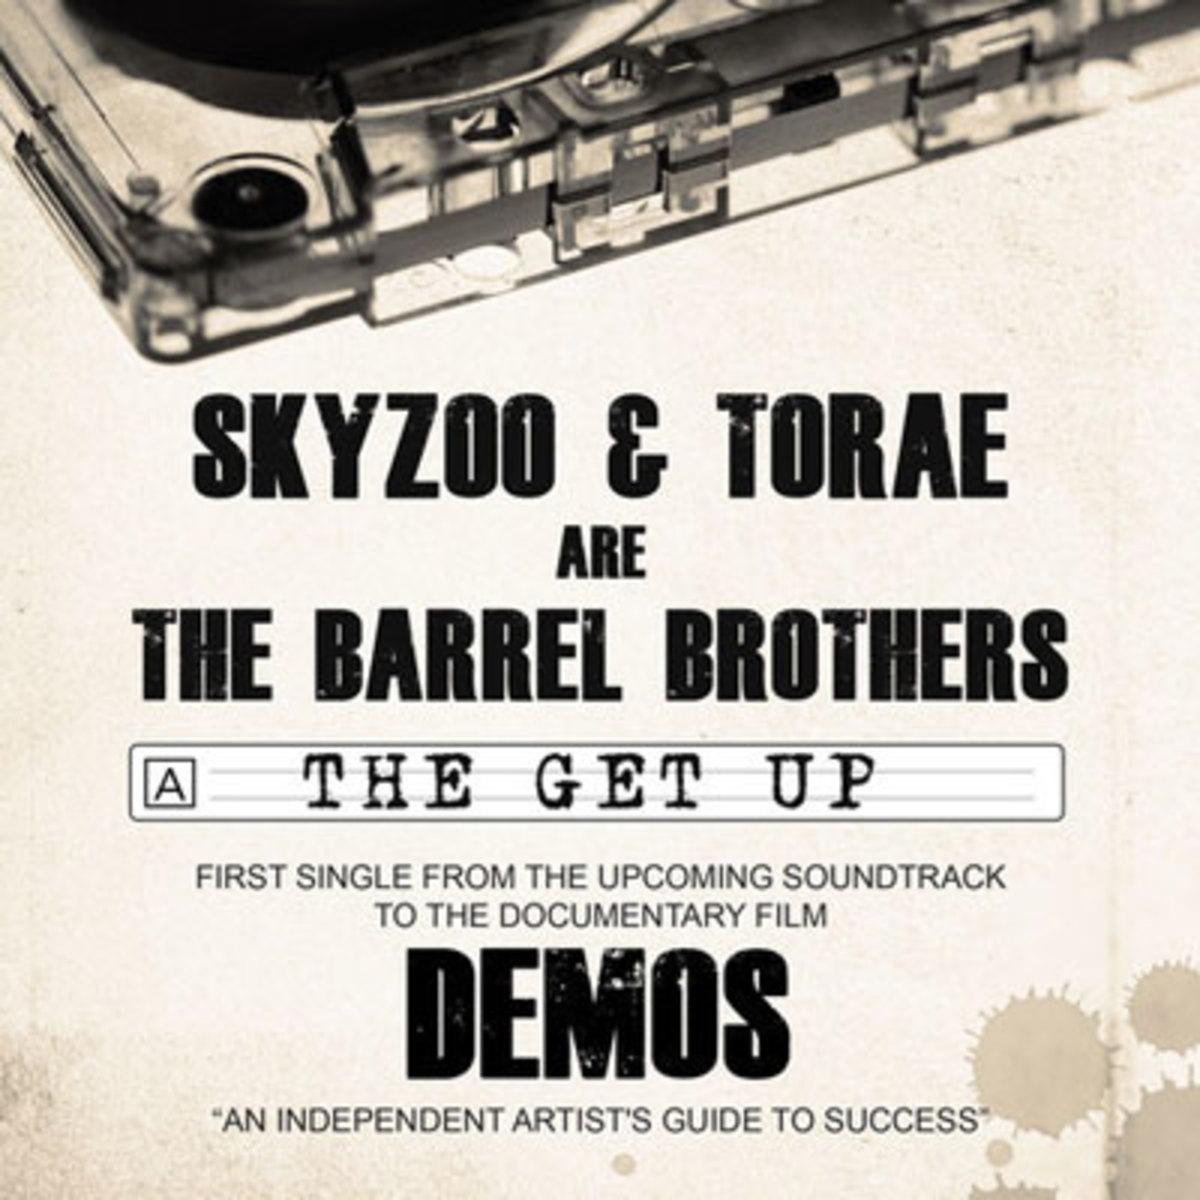 barrelbrothers-getup.jpg